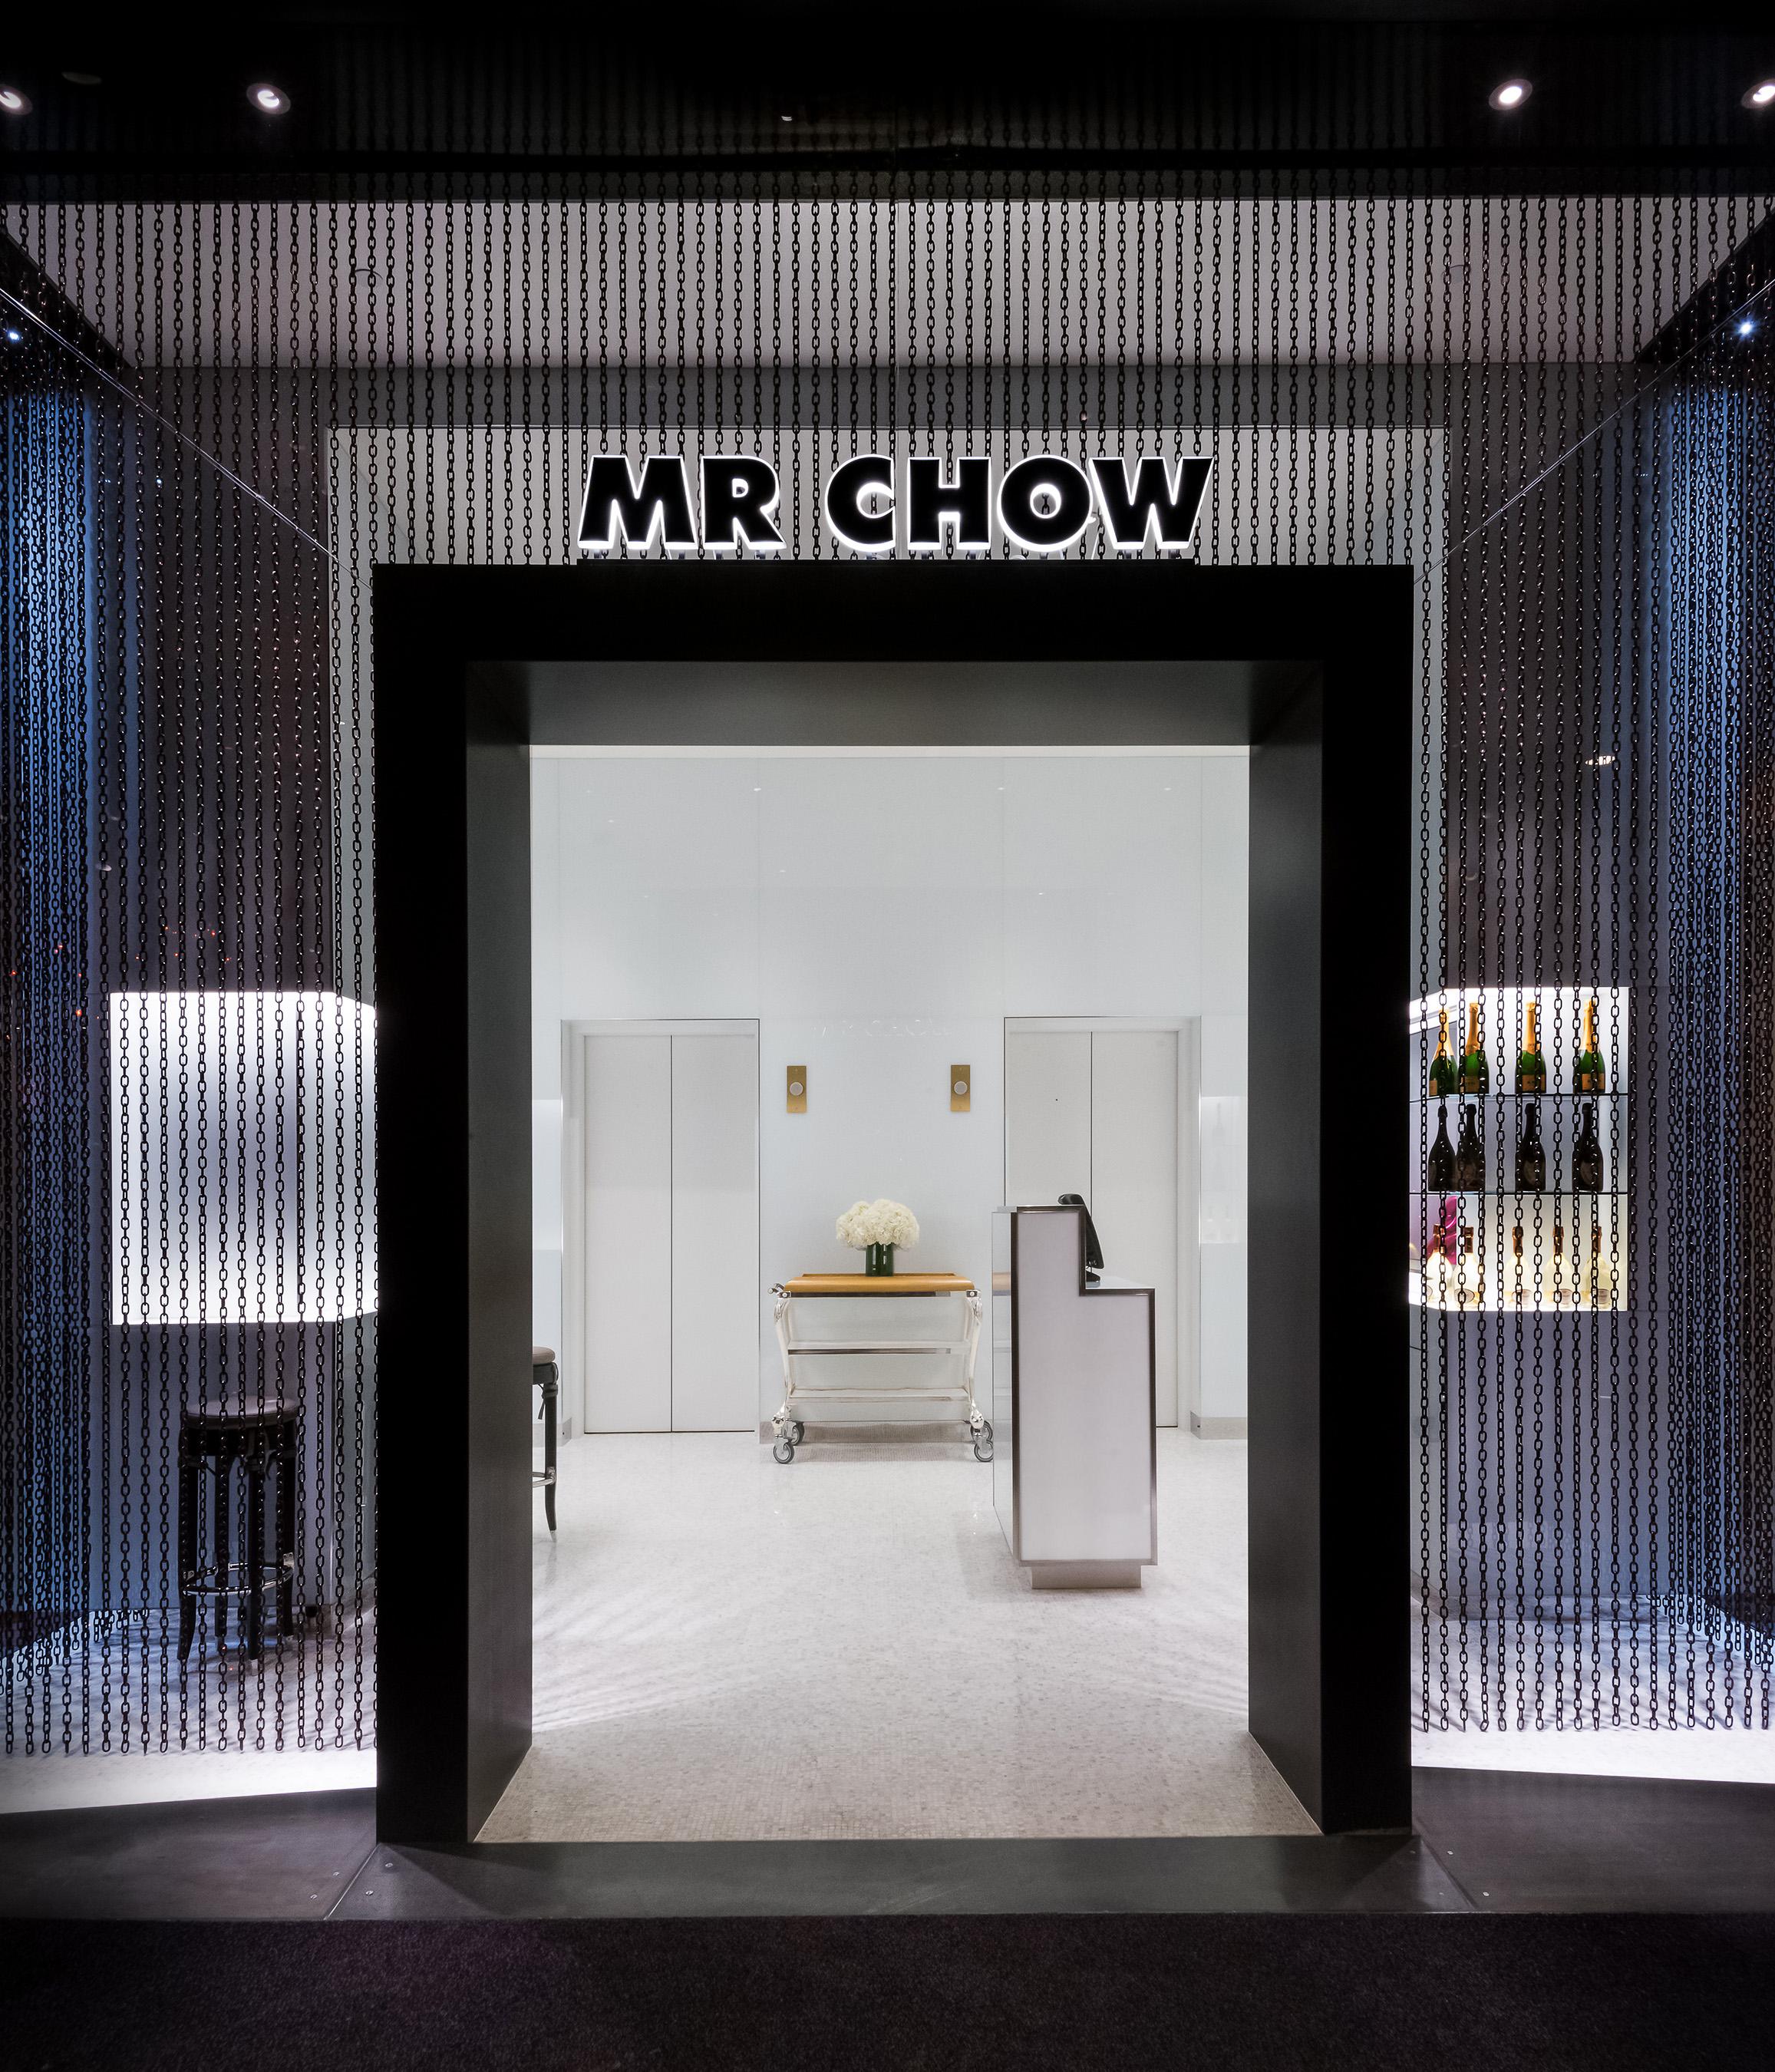 Mr. Chow Entrance